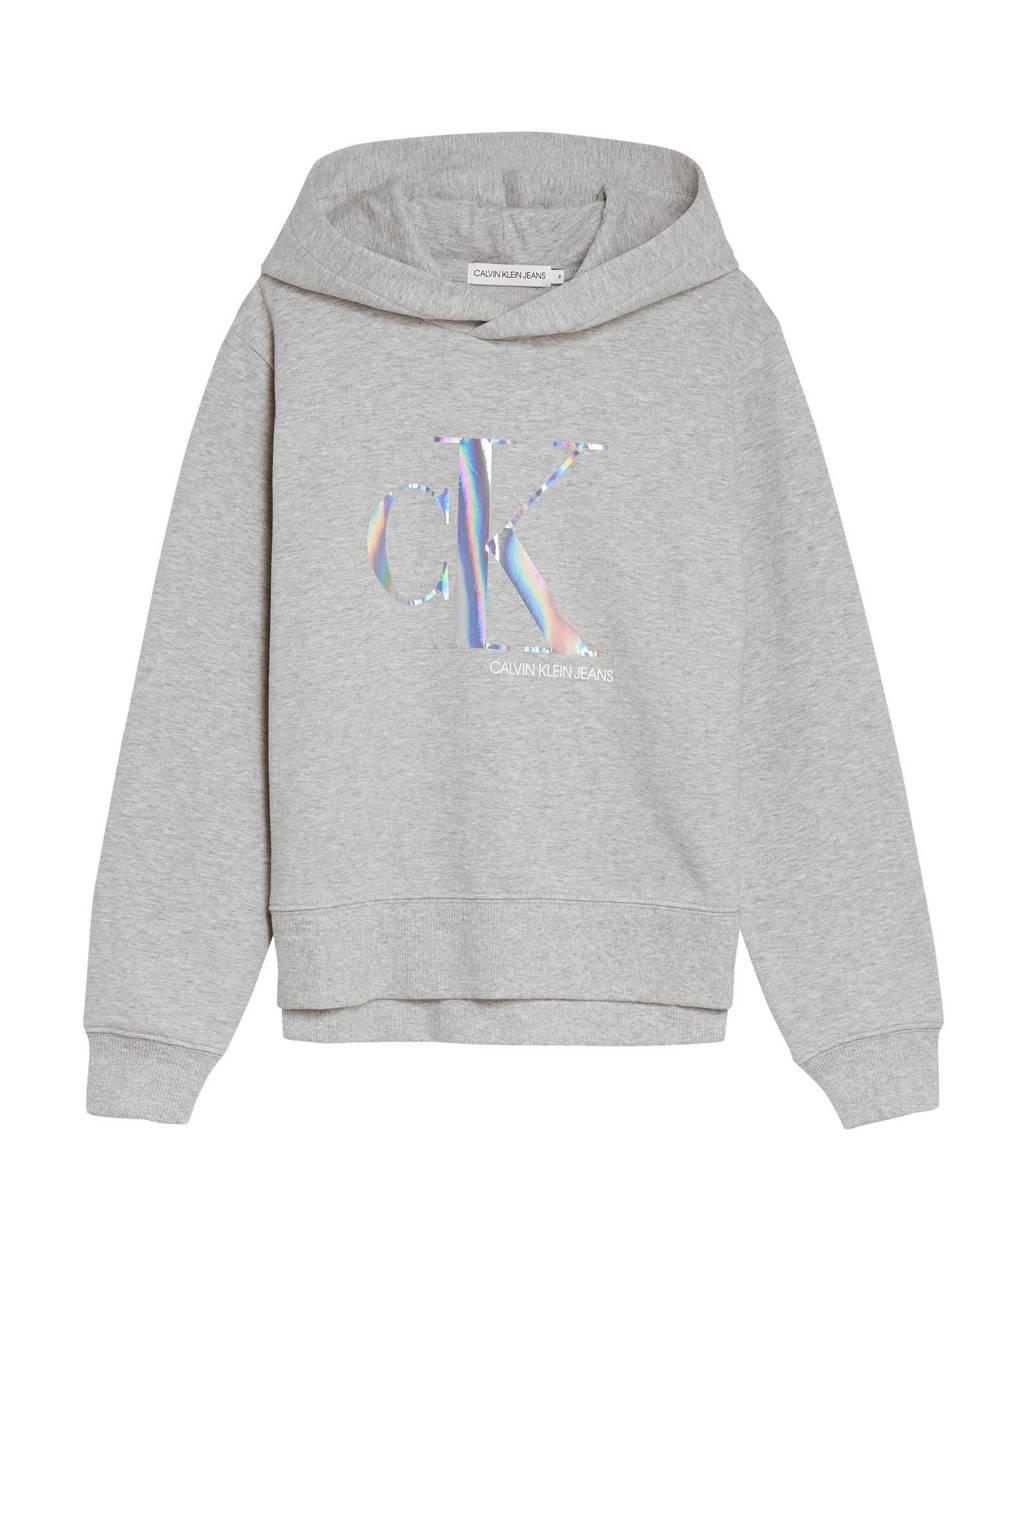 CALVIN KLEIN JEANS hoodie met logo lichtgrijs melange/zilver, Lichtgrijs melange/zilver